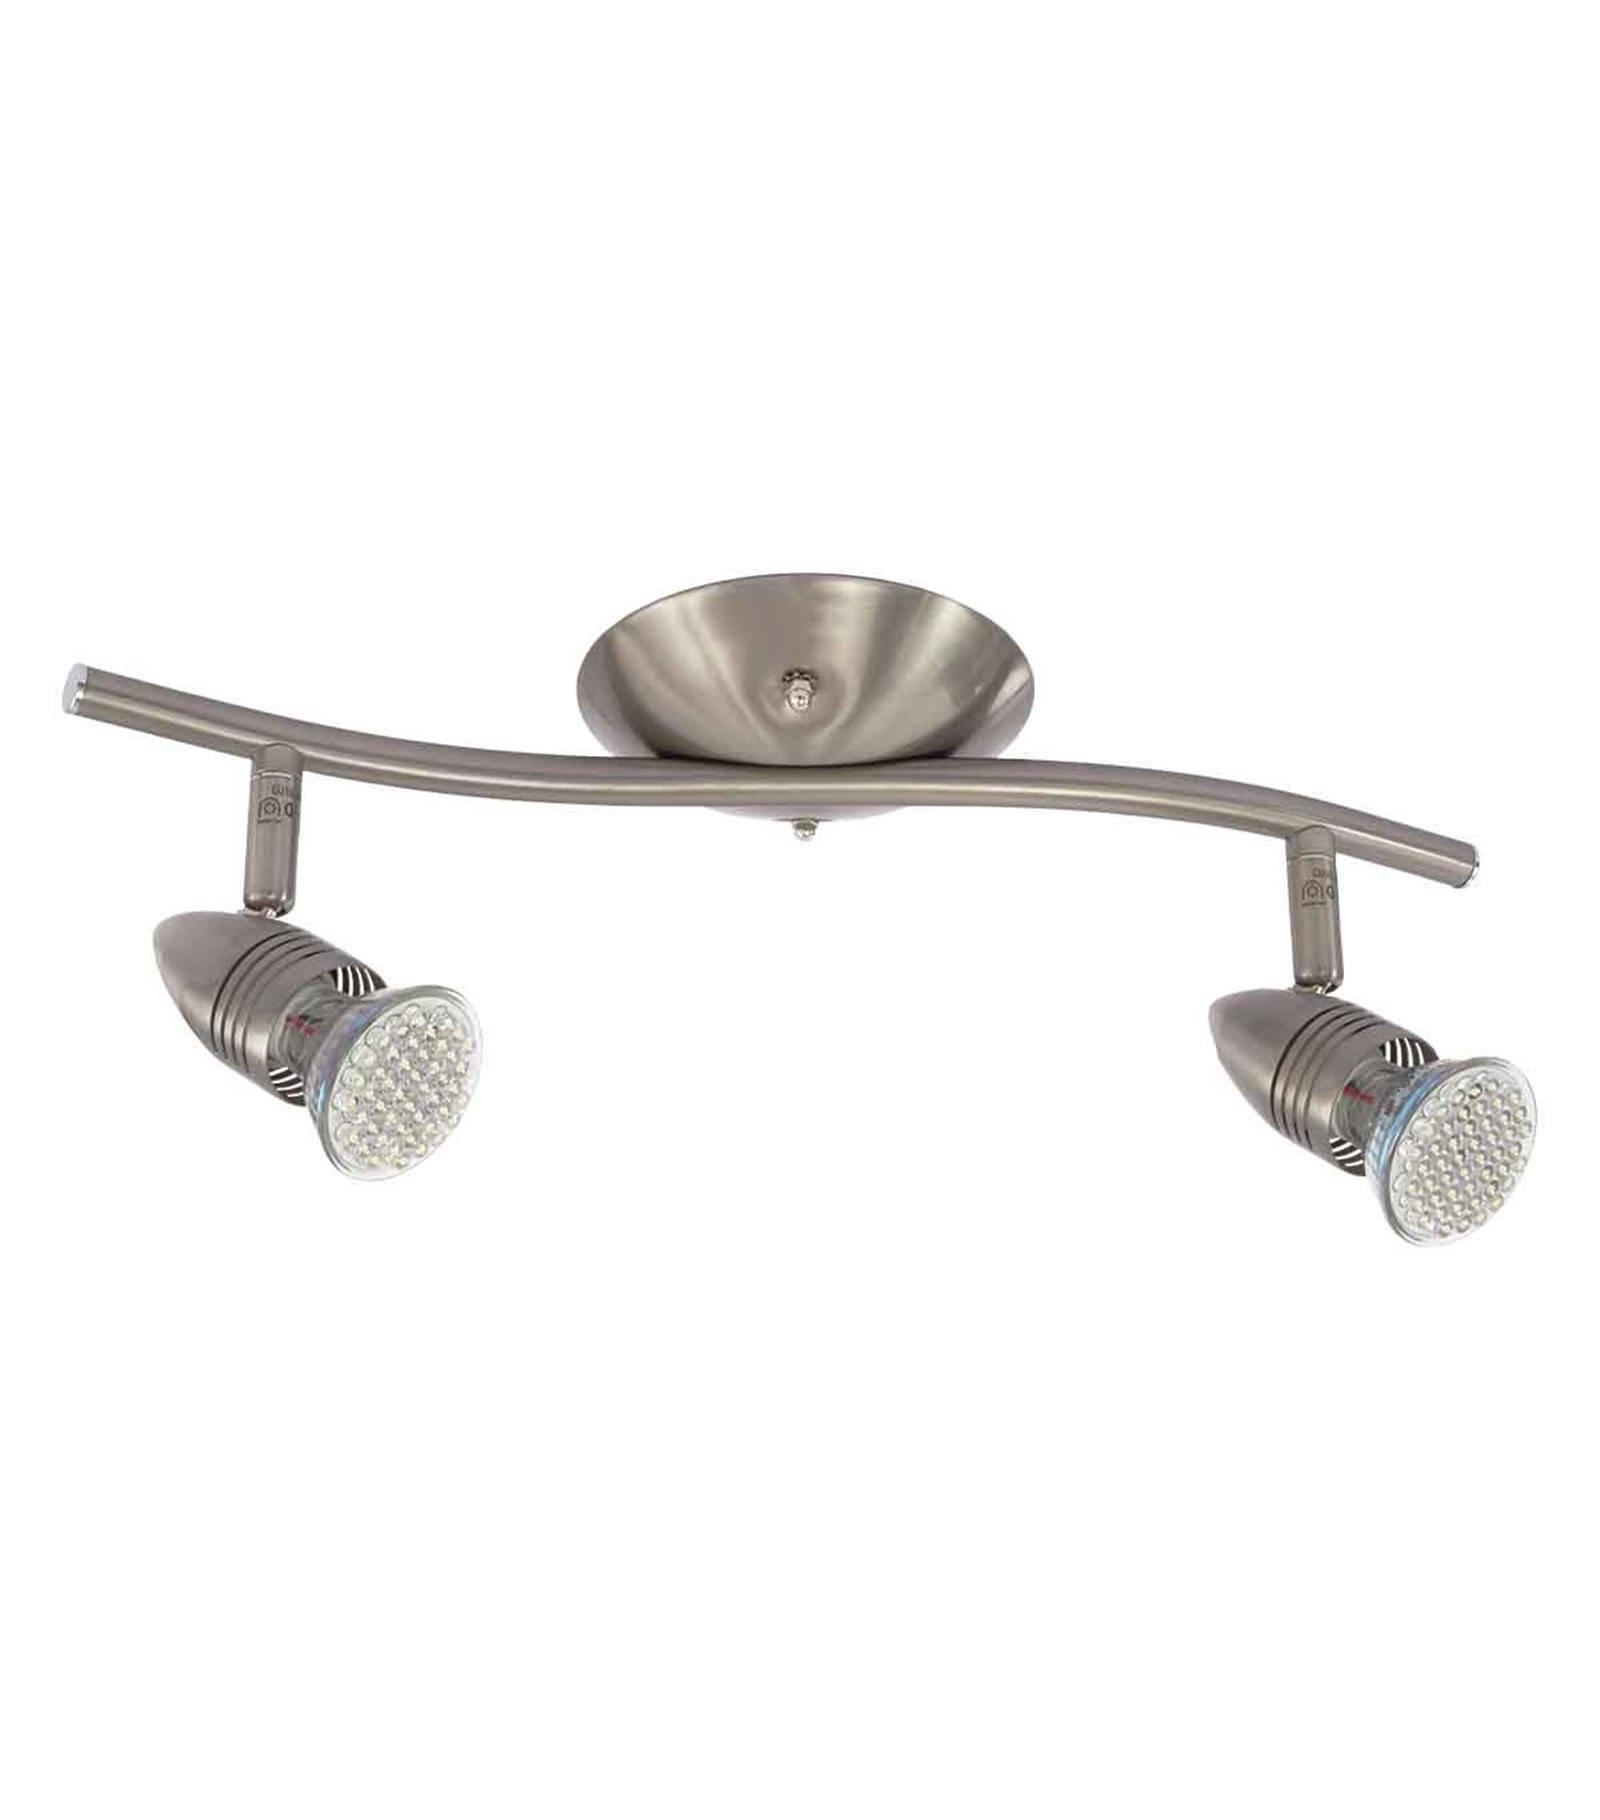 plafonnier luminaire moli chrome satin rond 2 spots gu10 ip20 orientable kanlux plafonnier. Black Bedroom Furniture Sets. Home Design Ideas